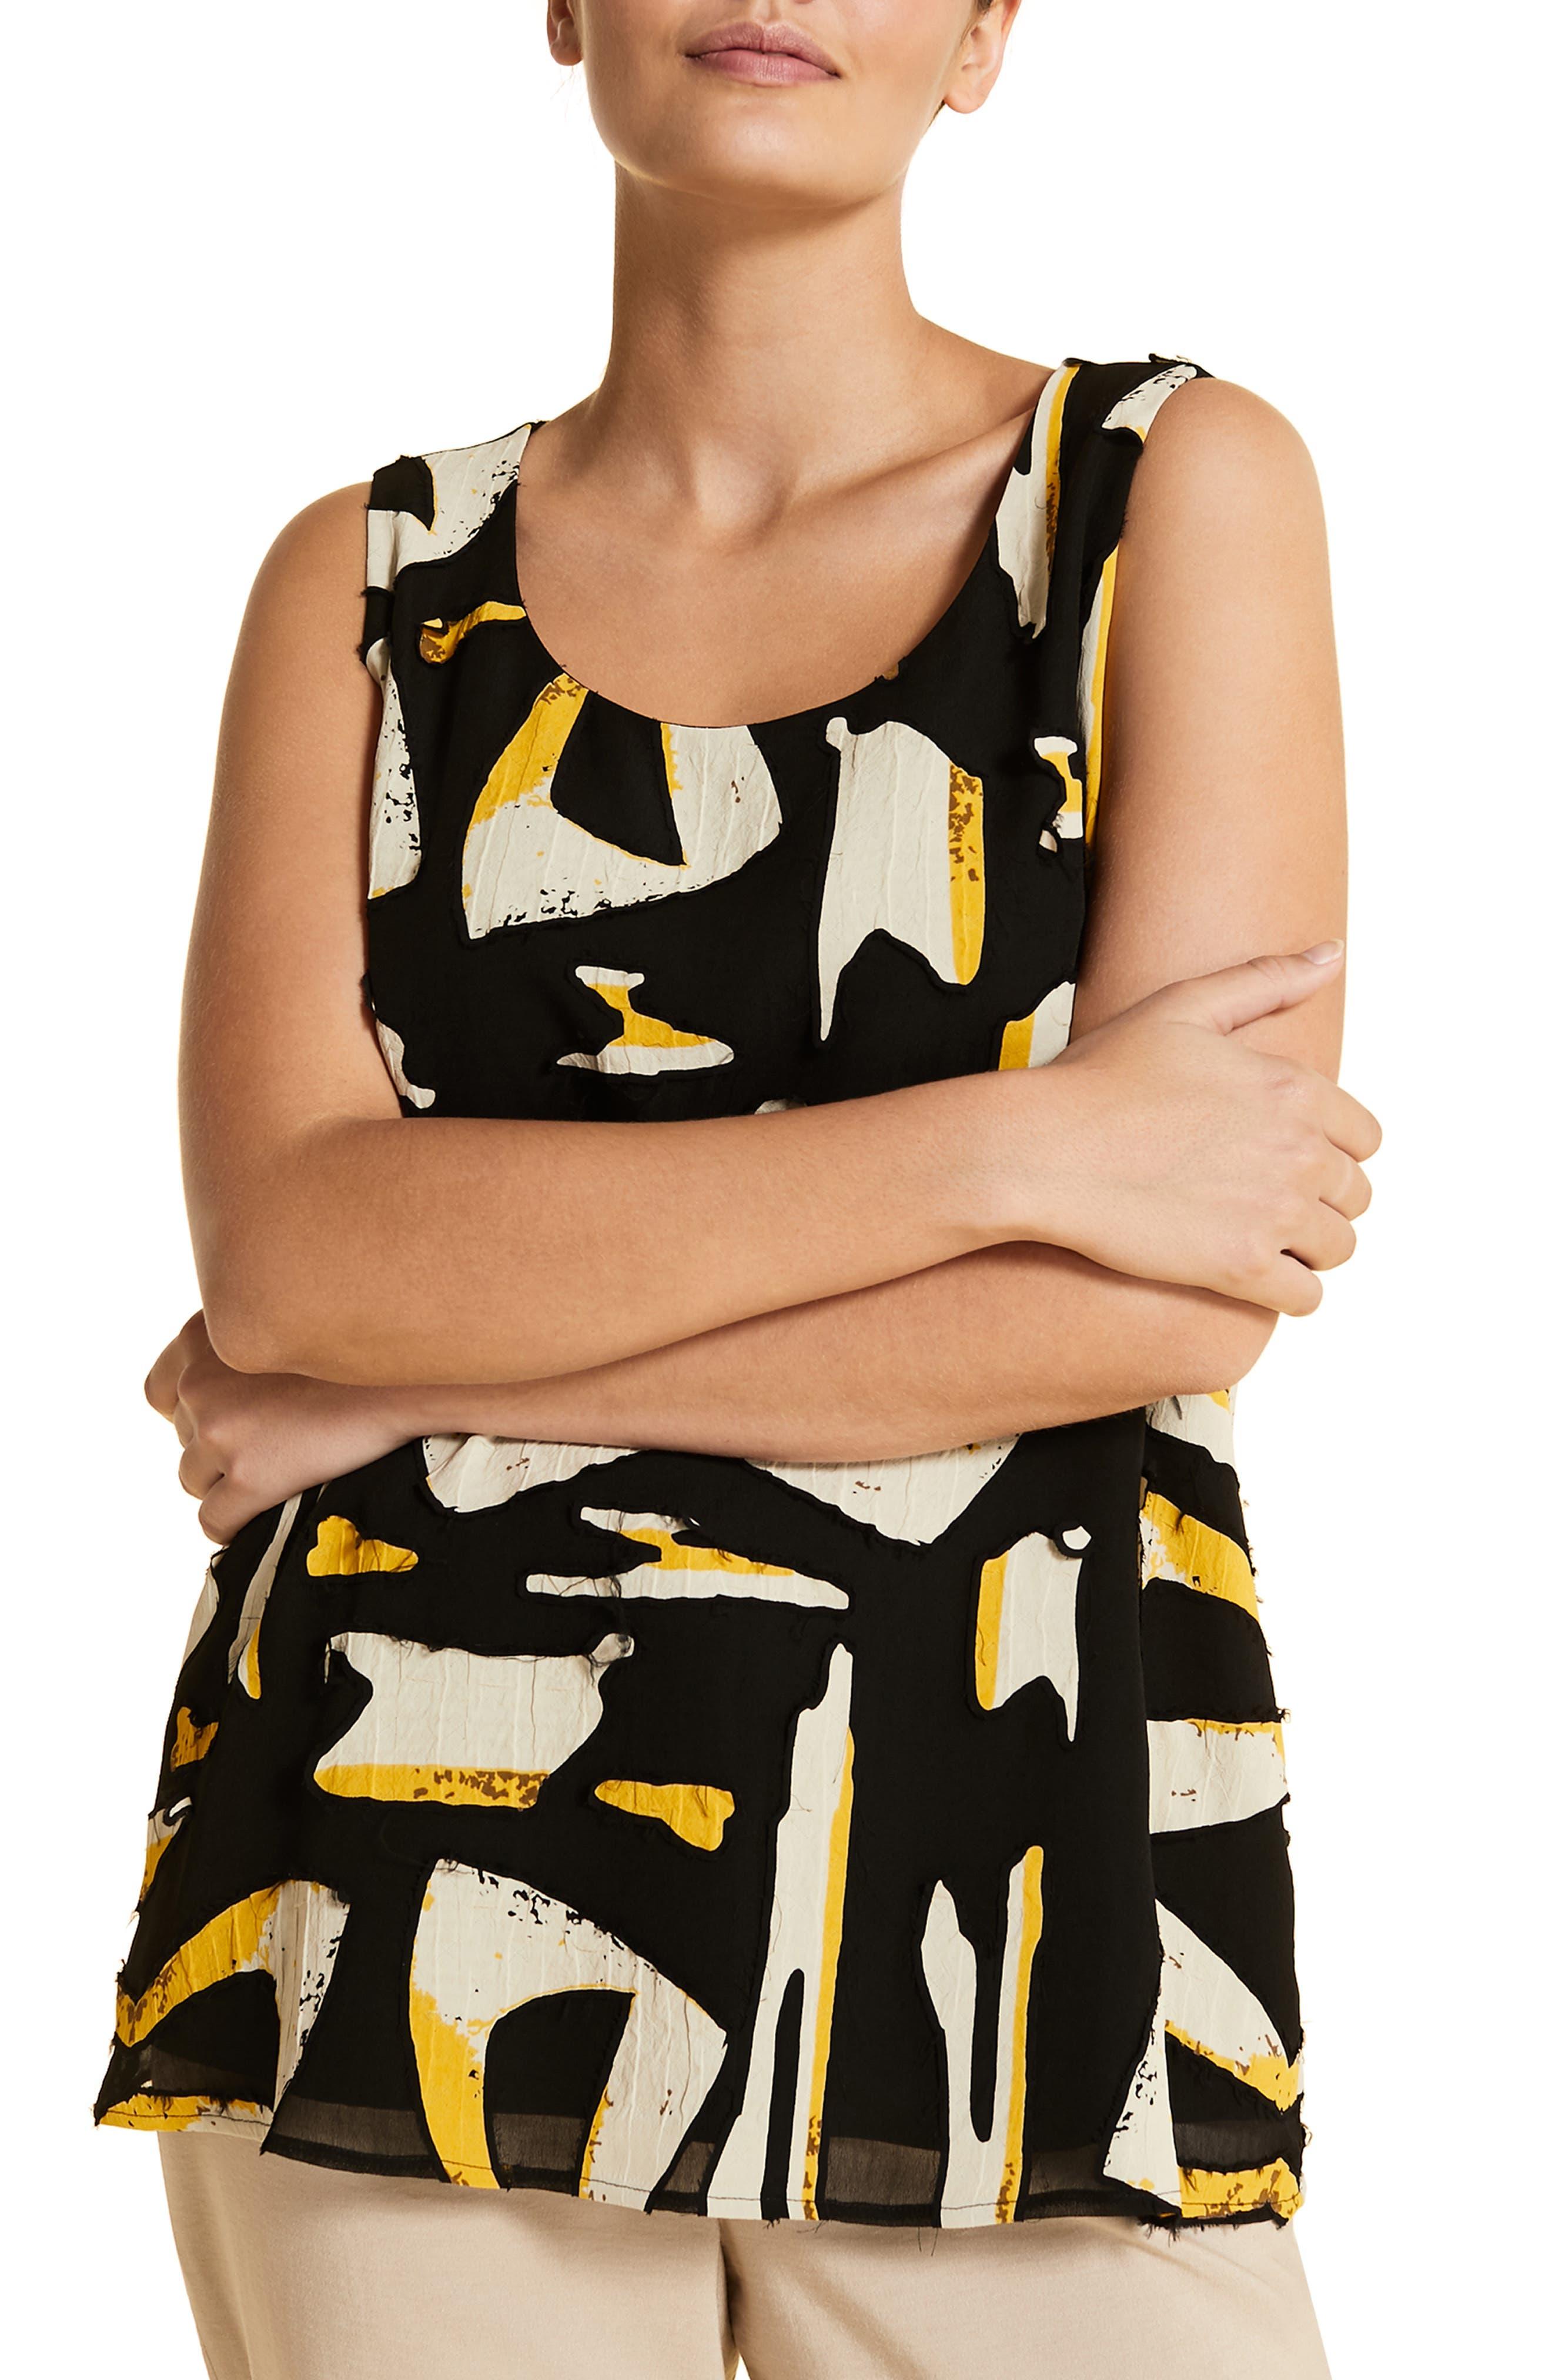 plus size women's marina rinaldi bilbao sleeveless top